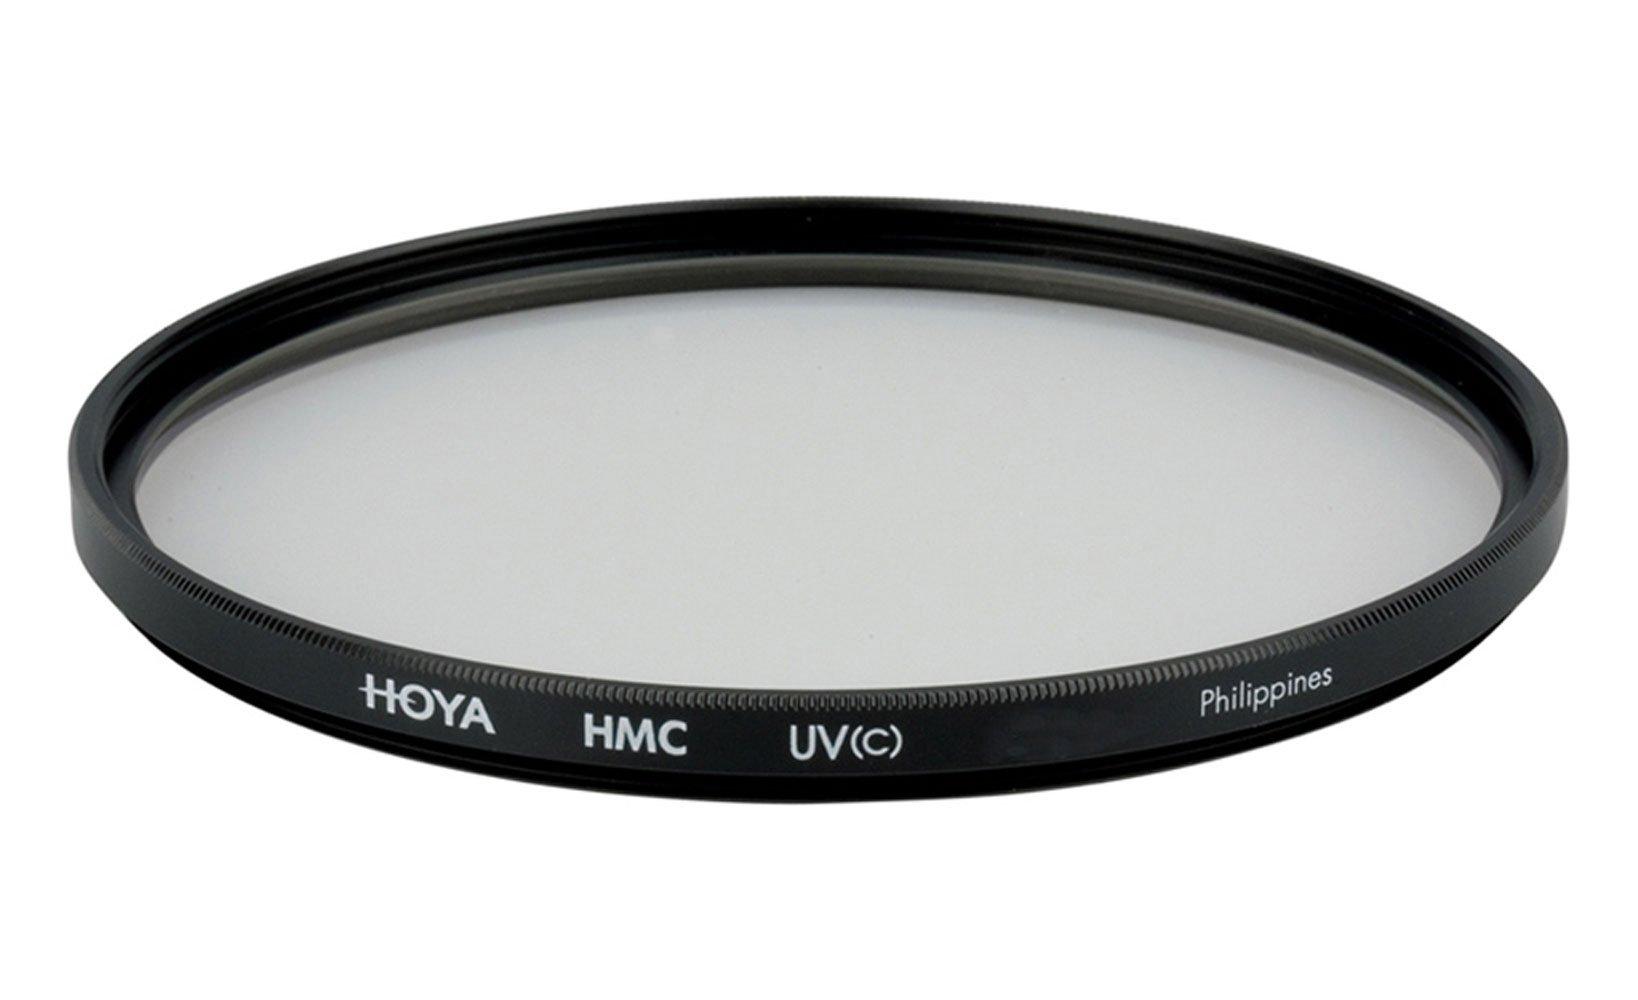 Hoya 55 mm UV(C) Digital HMC Screw-in Filter, Black